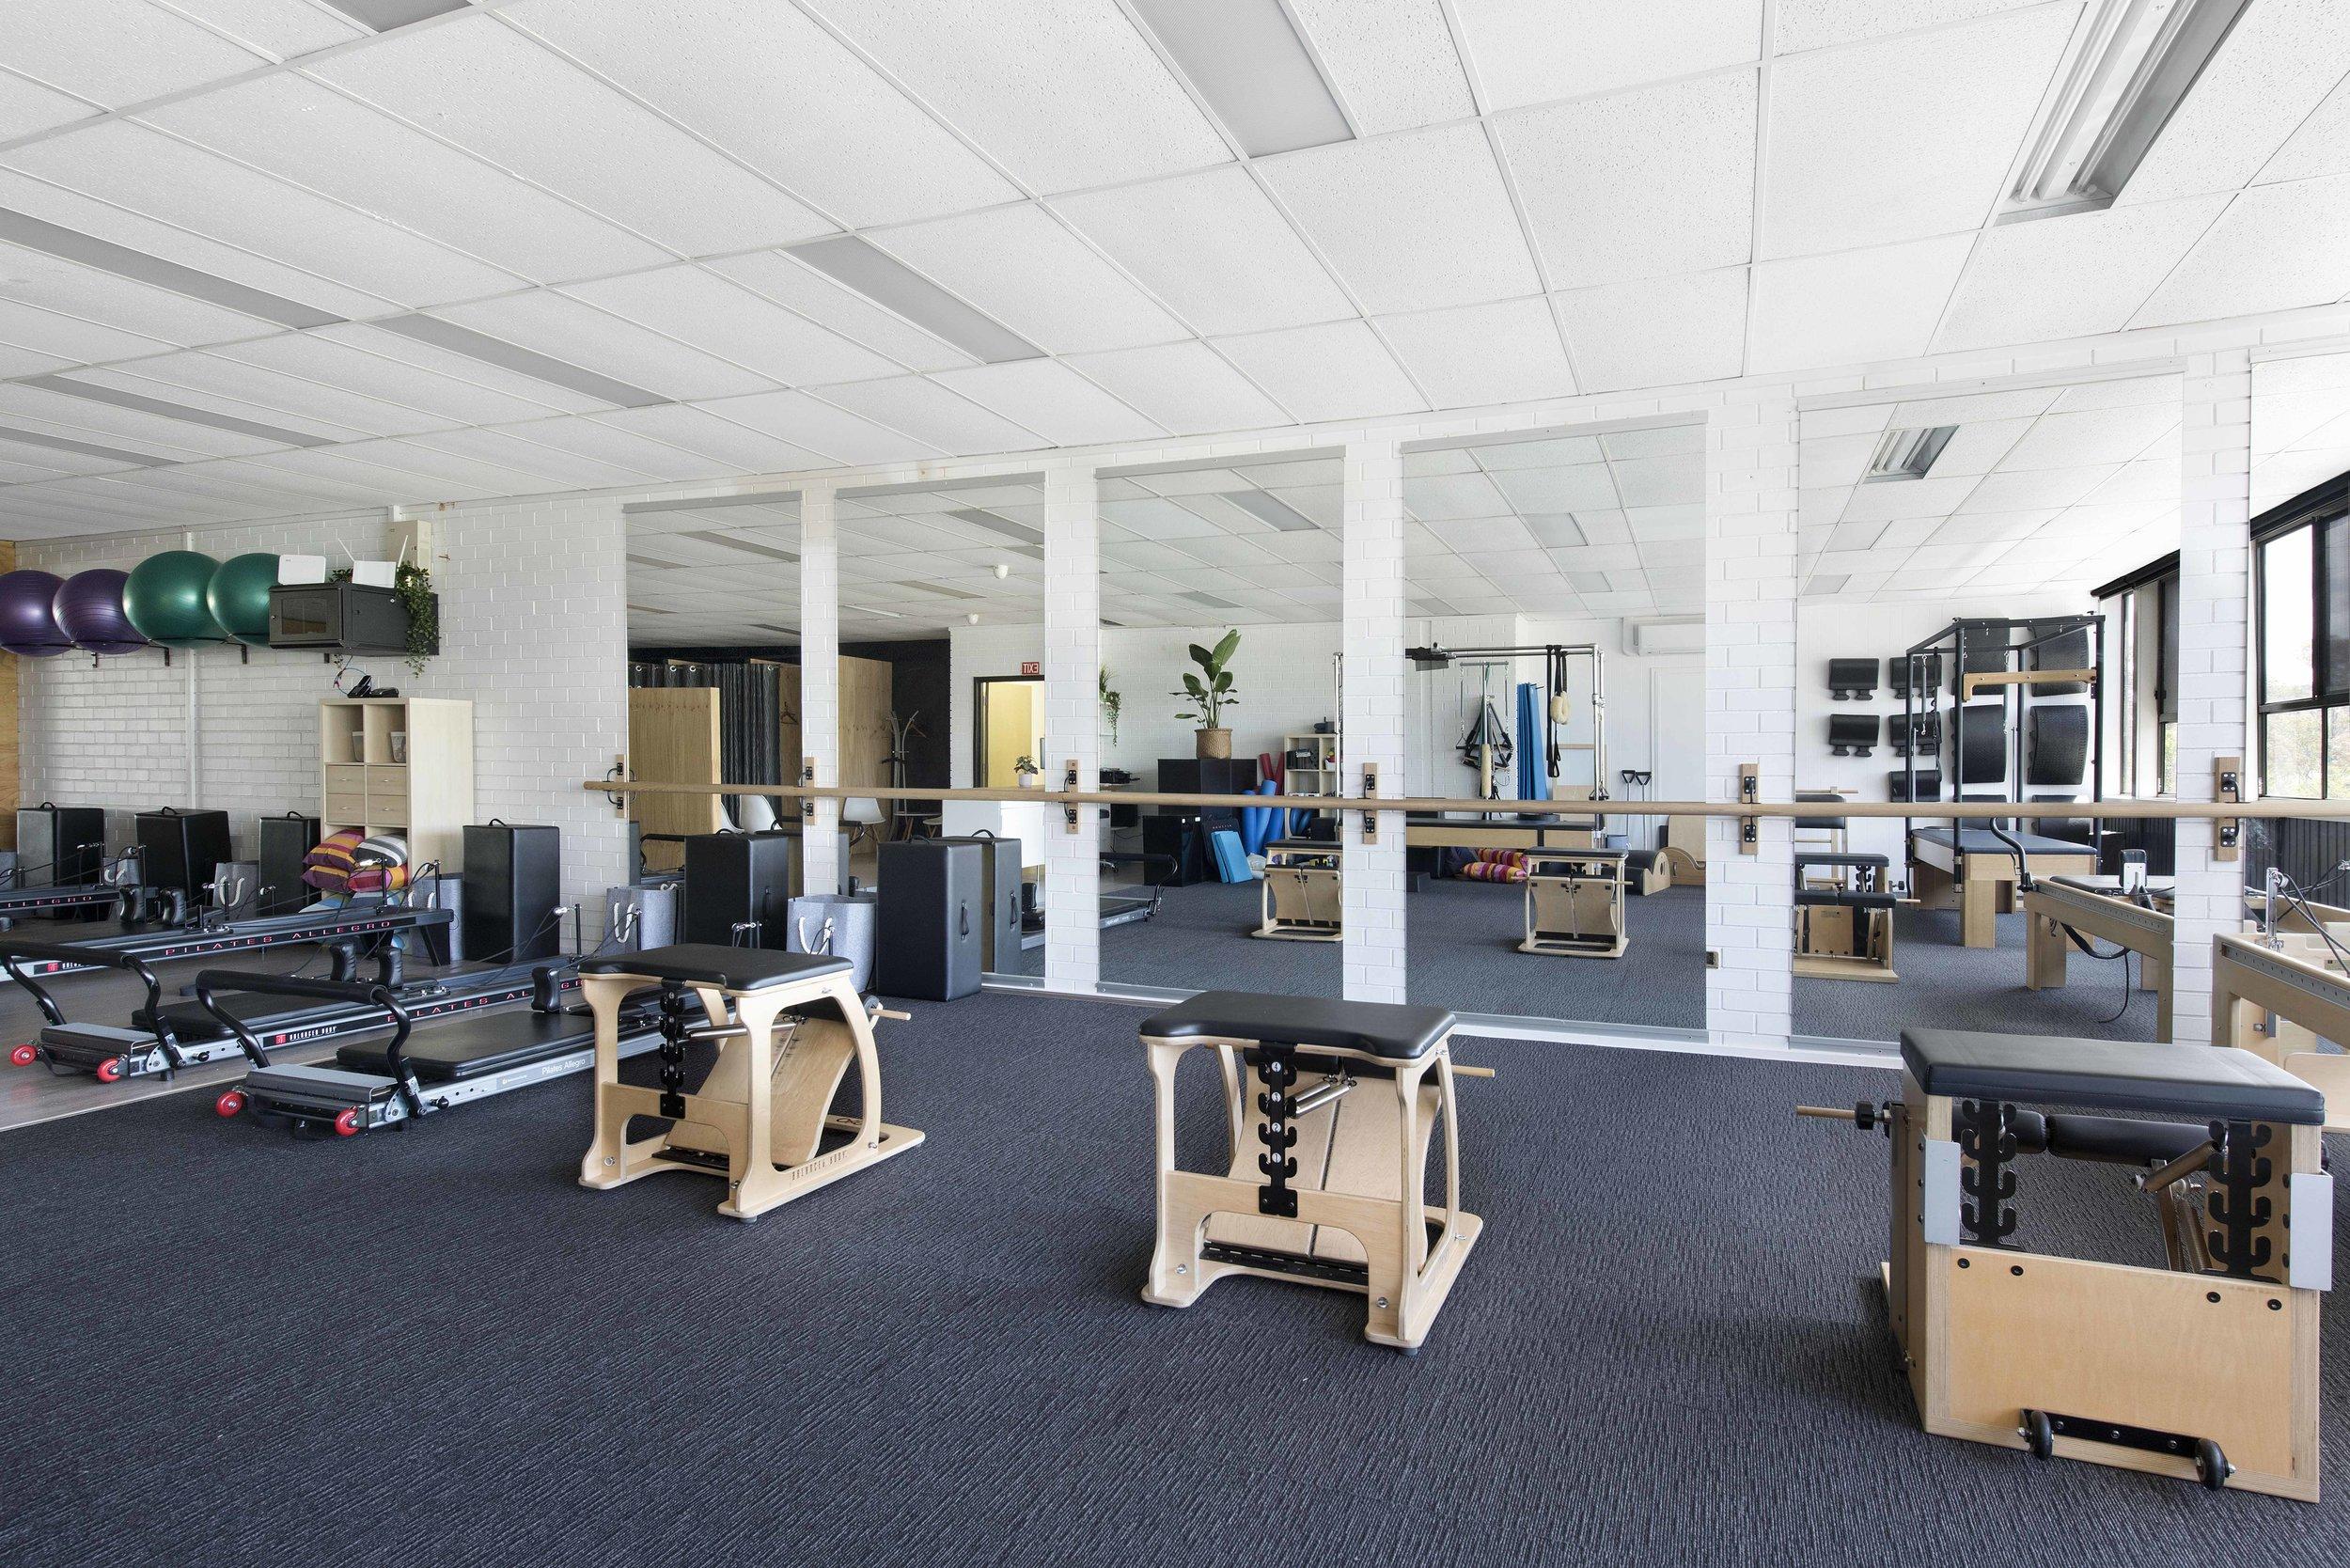 Pilates Centre_21.jpg